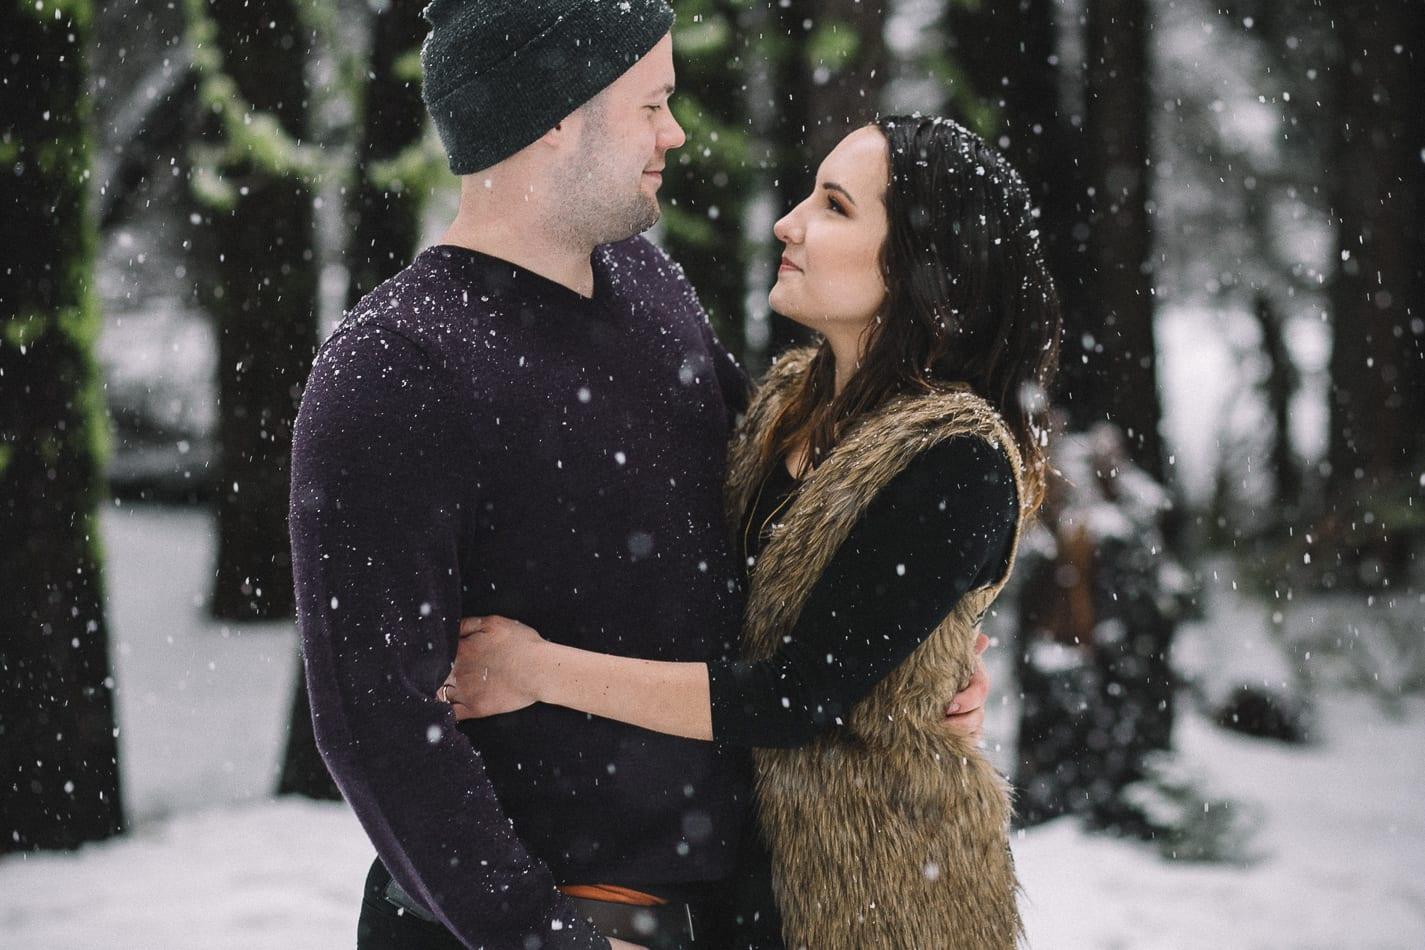 mount-lassen-winter-engagement-photo-5